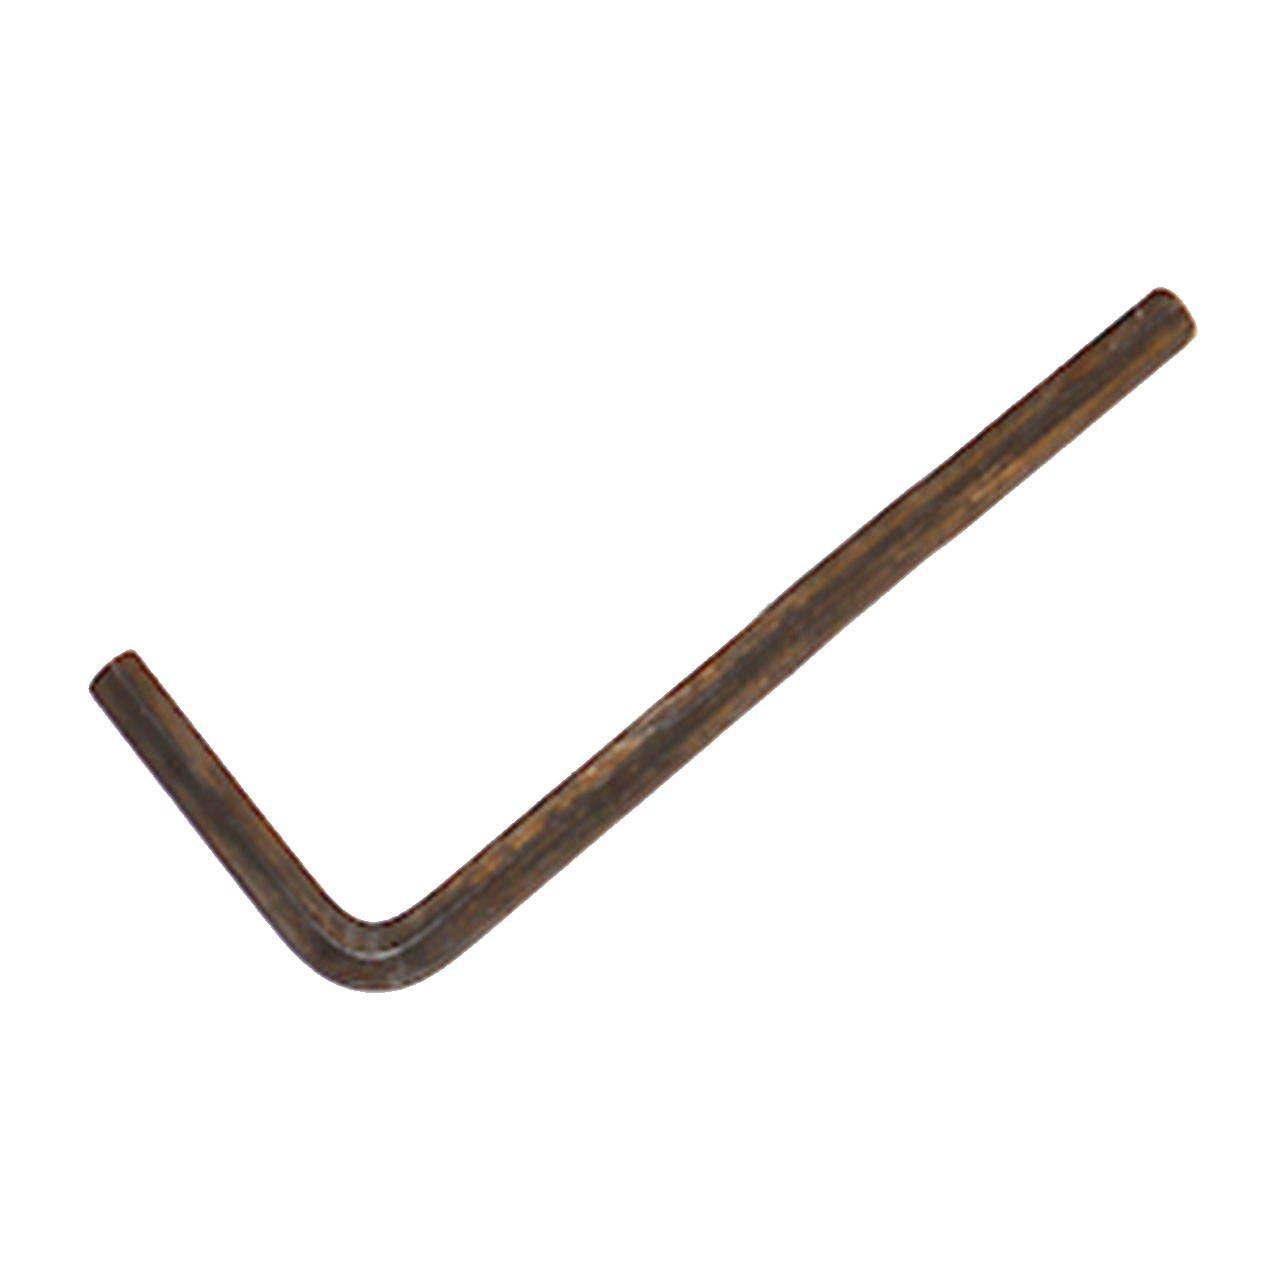 Shindaiwa X605000100 - Wrench Hex 4mm (Original OEM part) - ID-11100